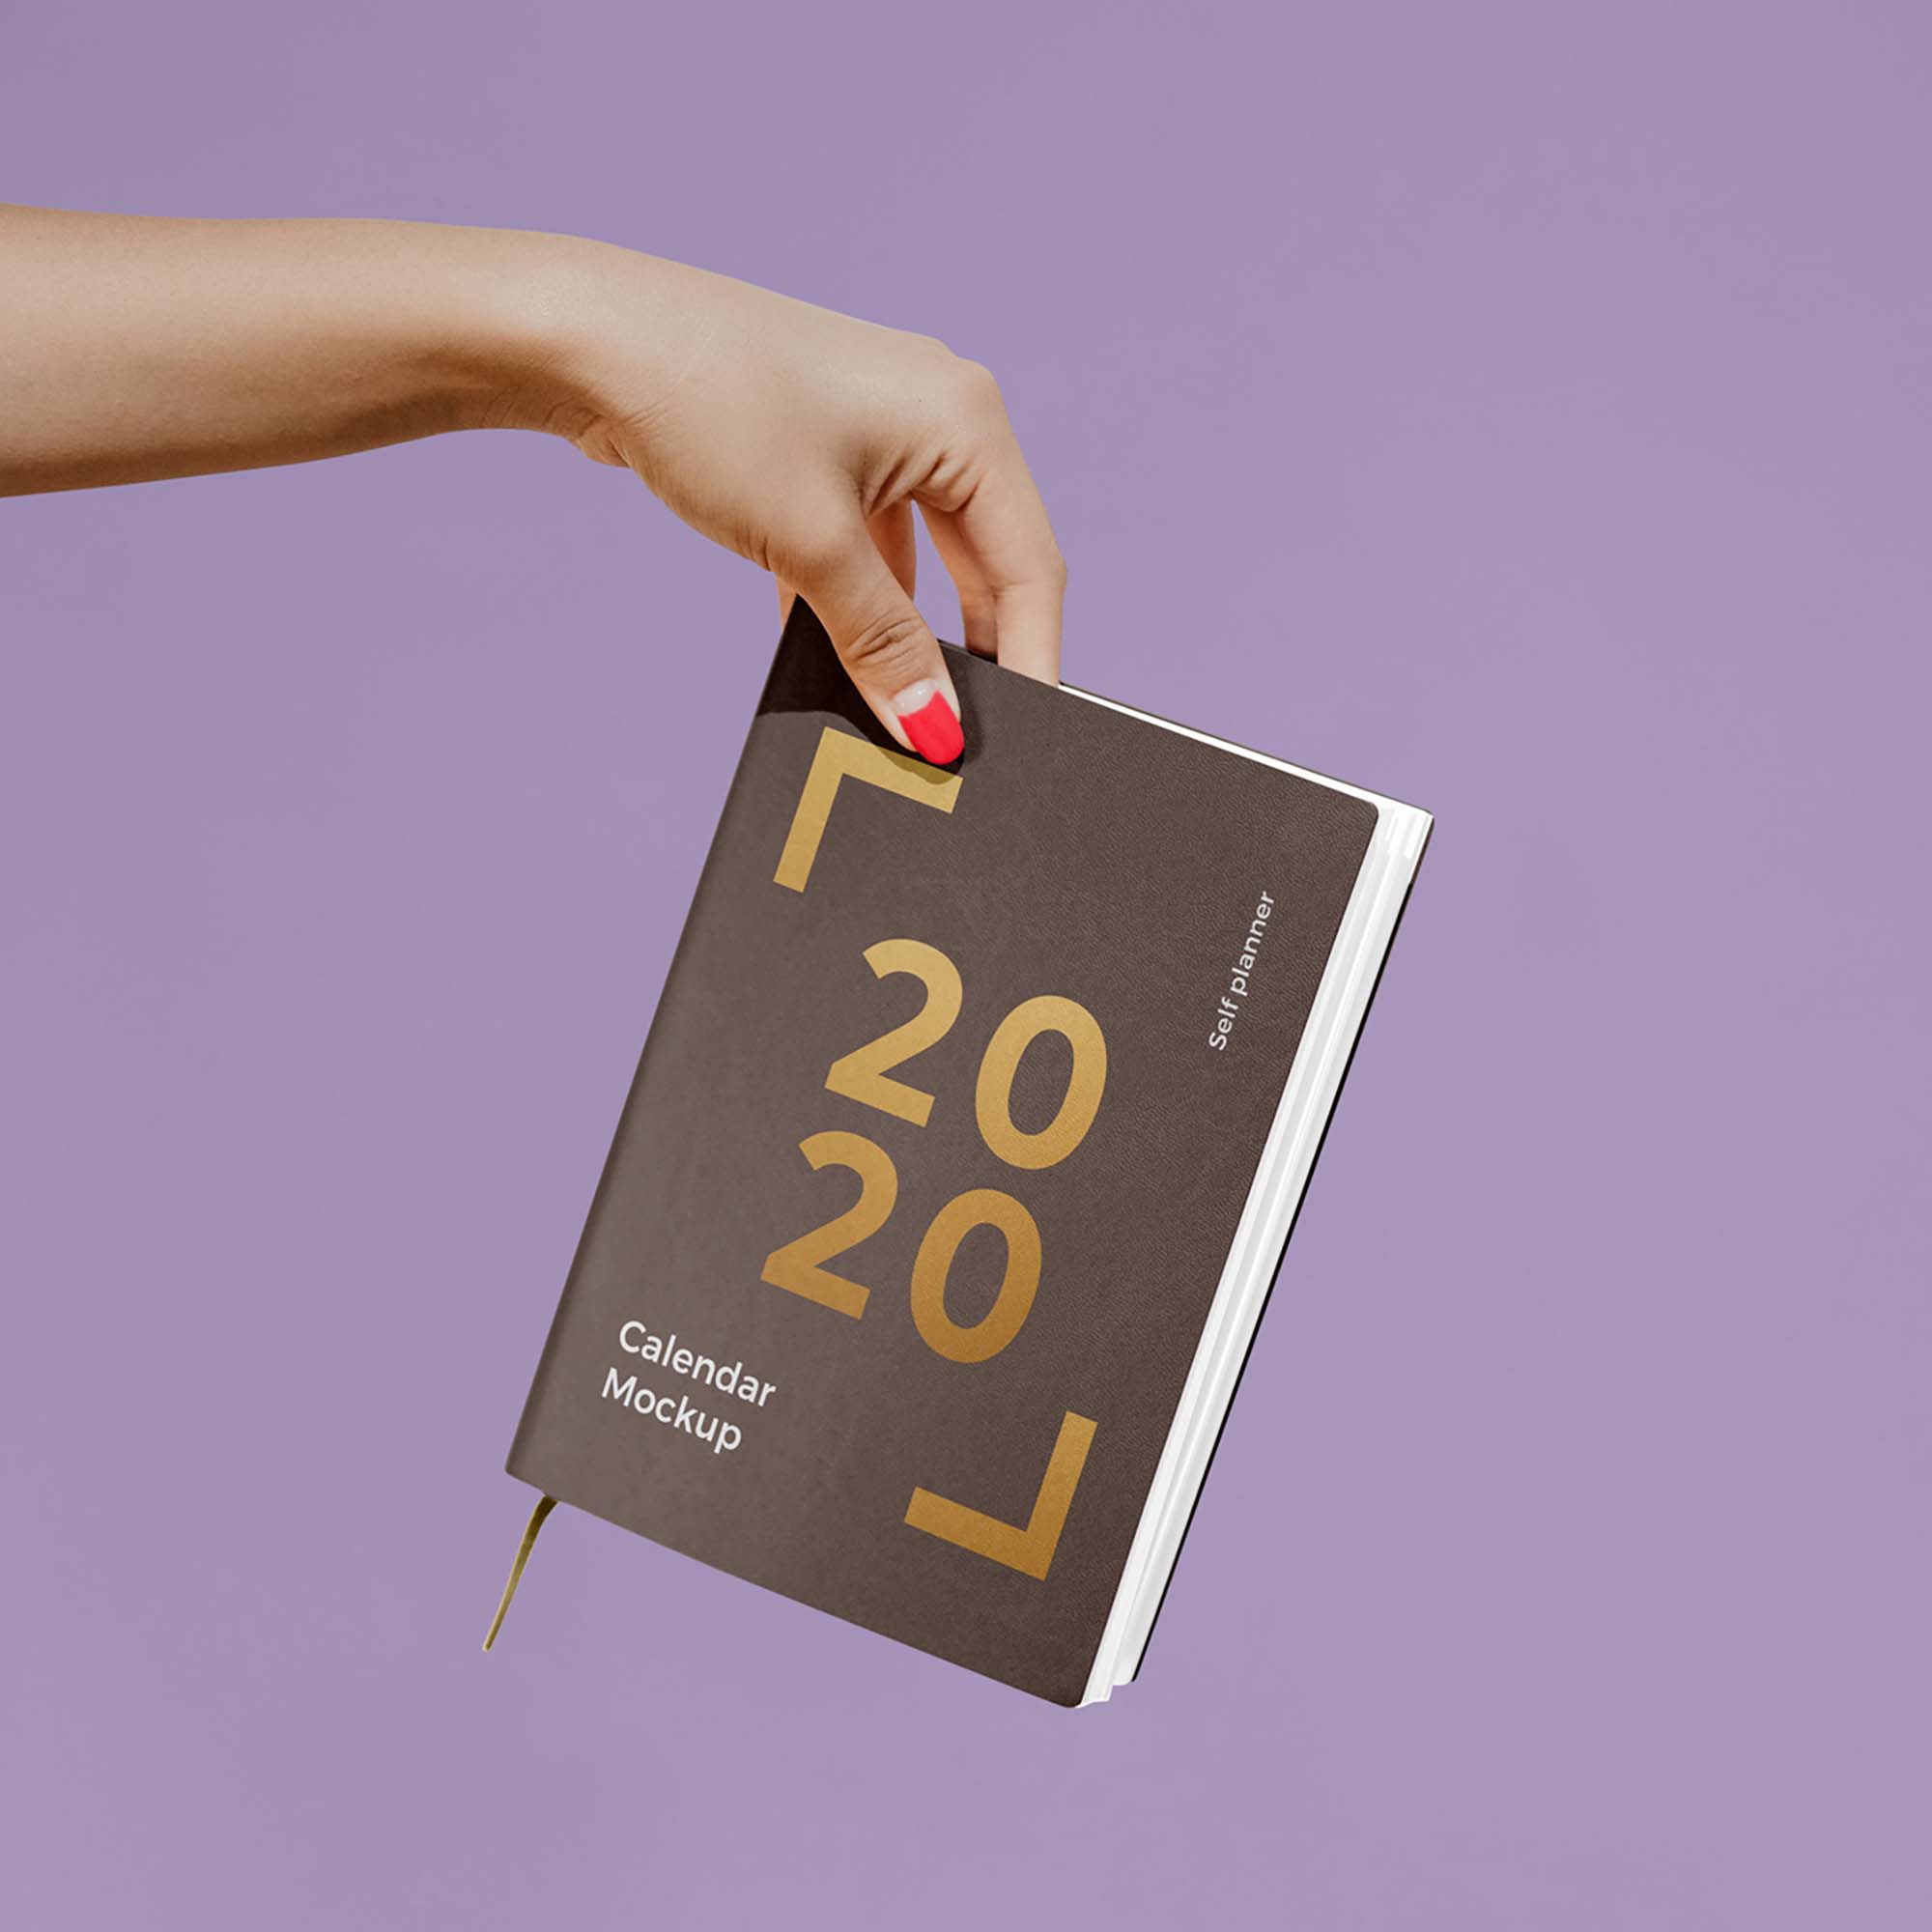 Calendar in Hand Mockup